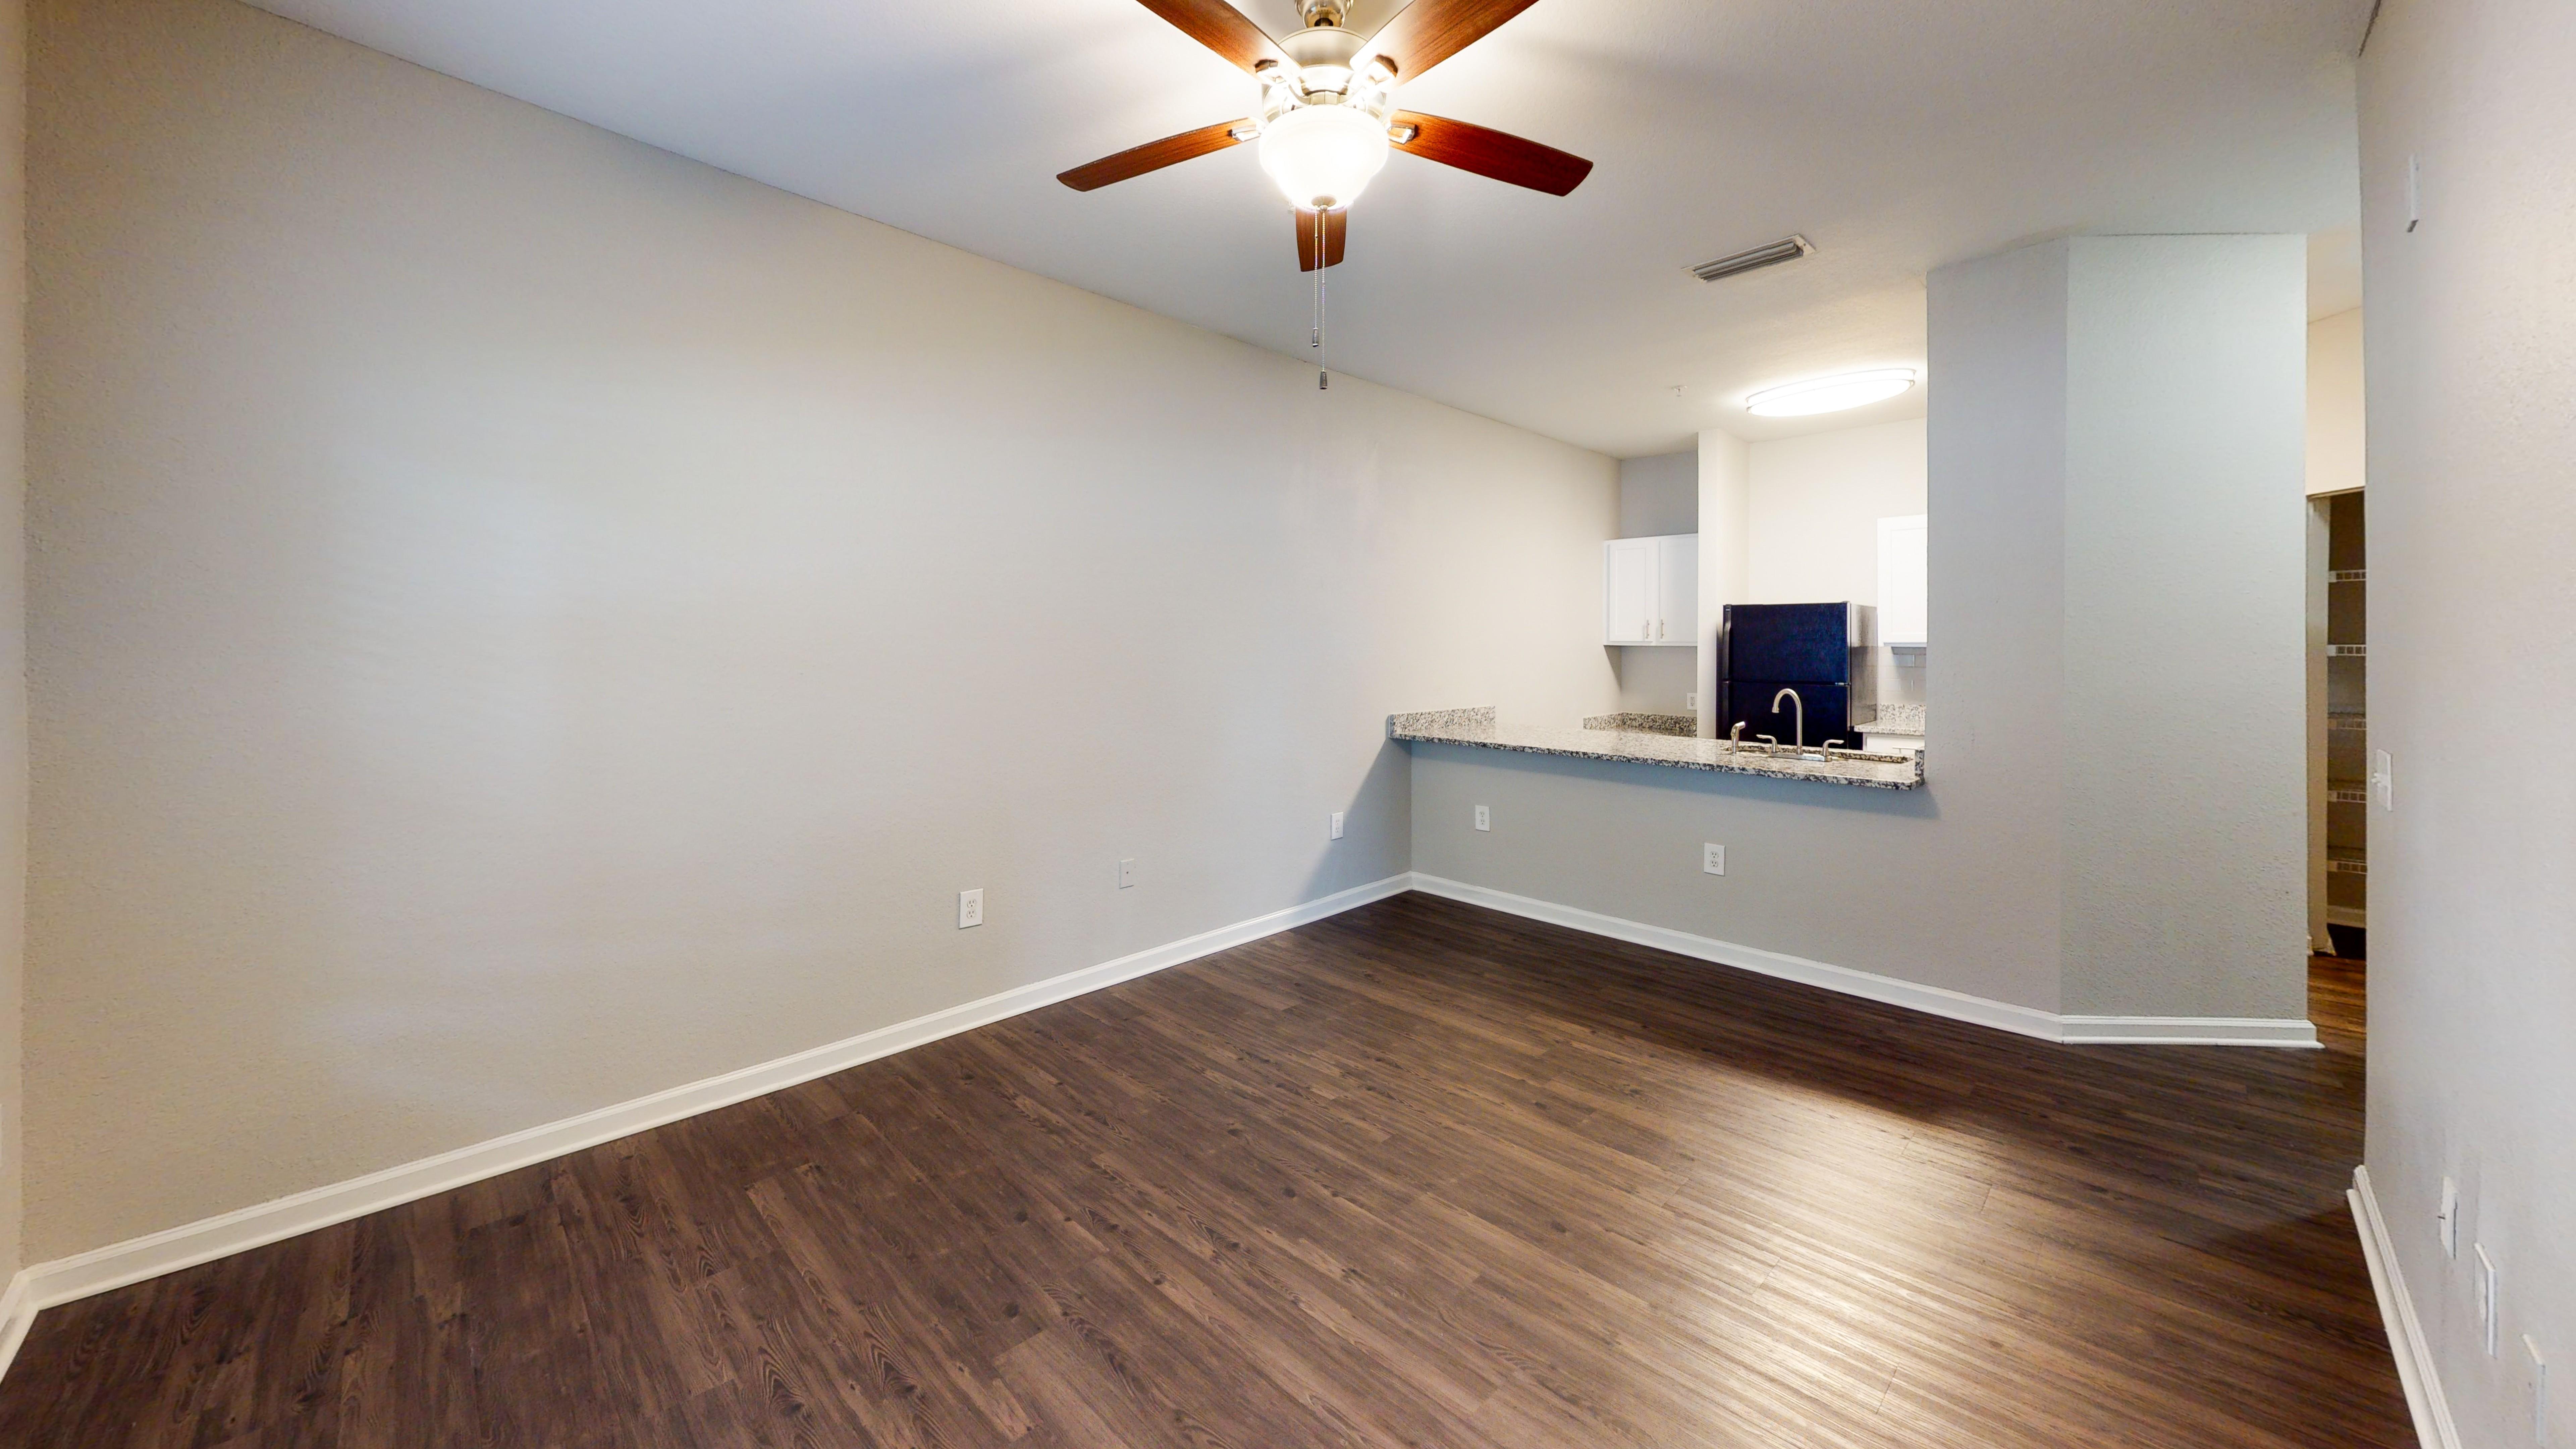 Apartments Near Coastal Law Edens Edge for Florida Coastal School of Law Students in Jacksonville, FL